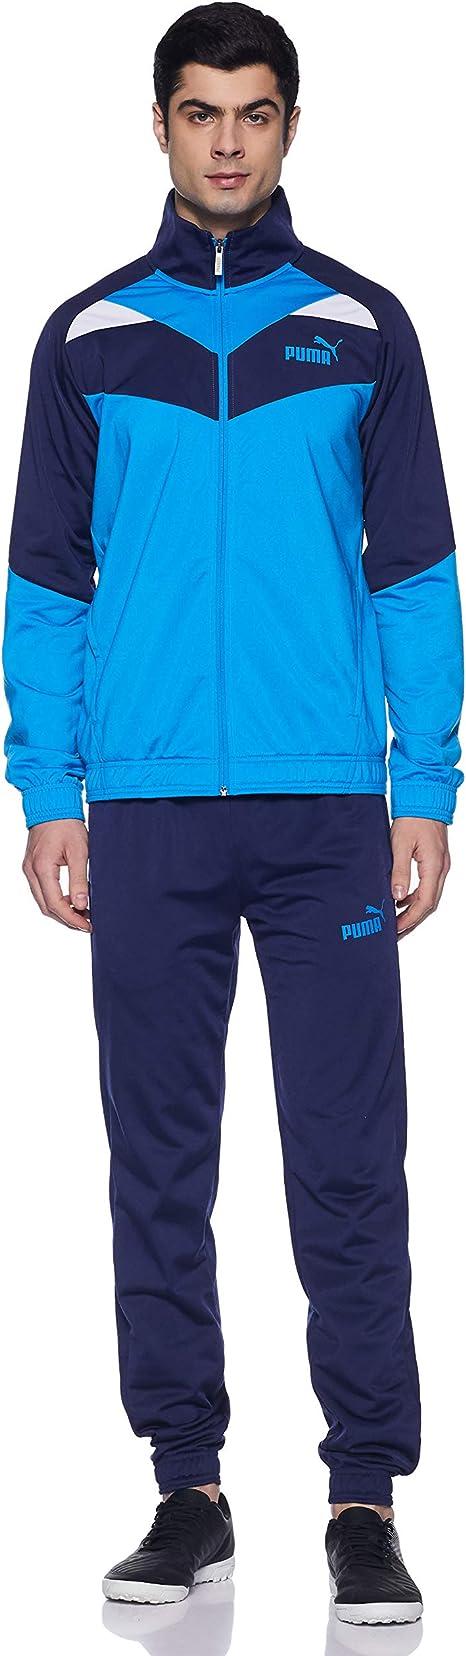 PUMA Iconic Tricot Suit Cl Chándal, Hombre: Amazon.es: Ropa y ...